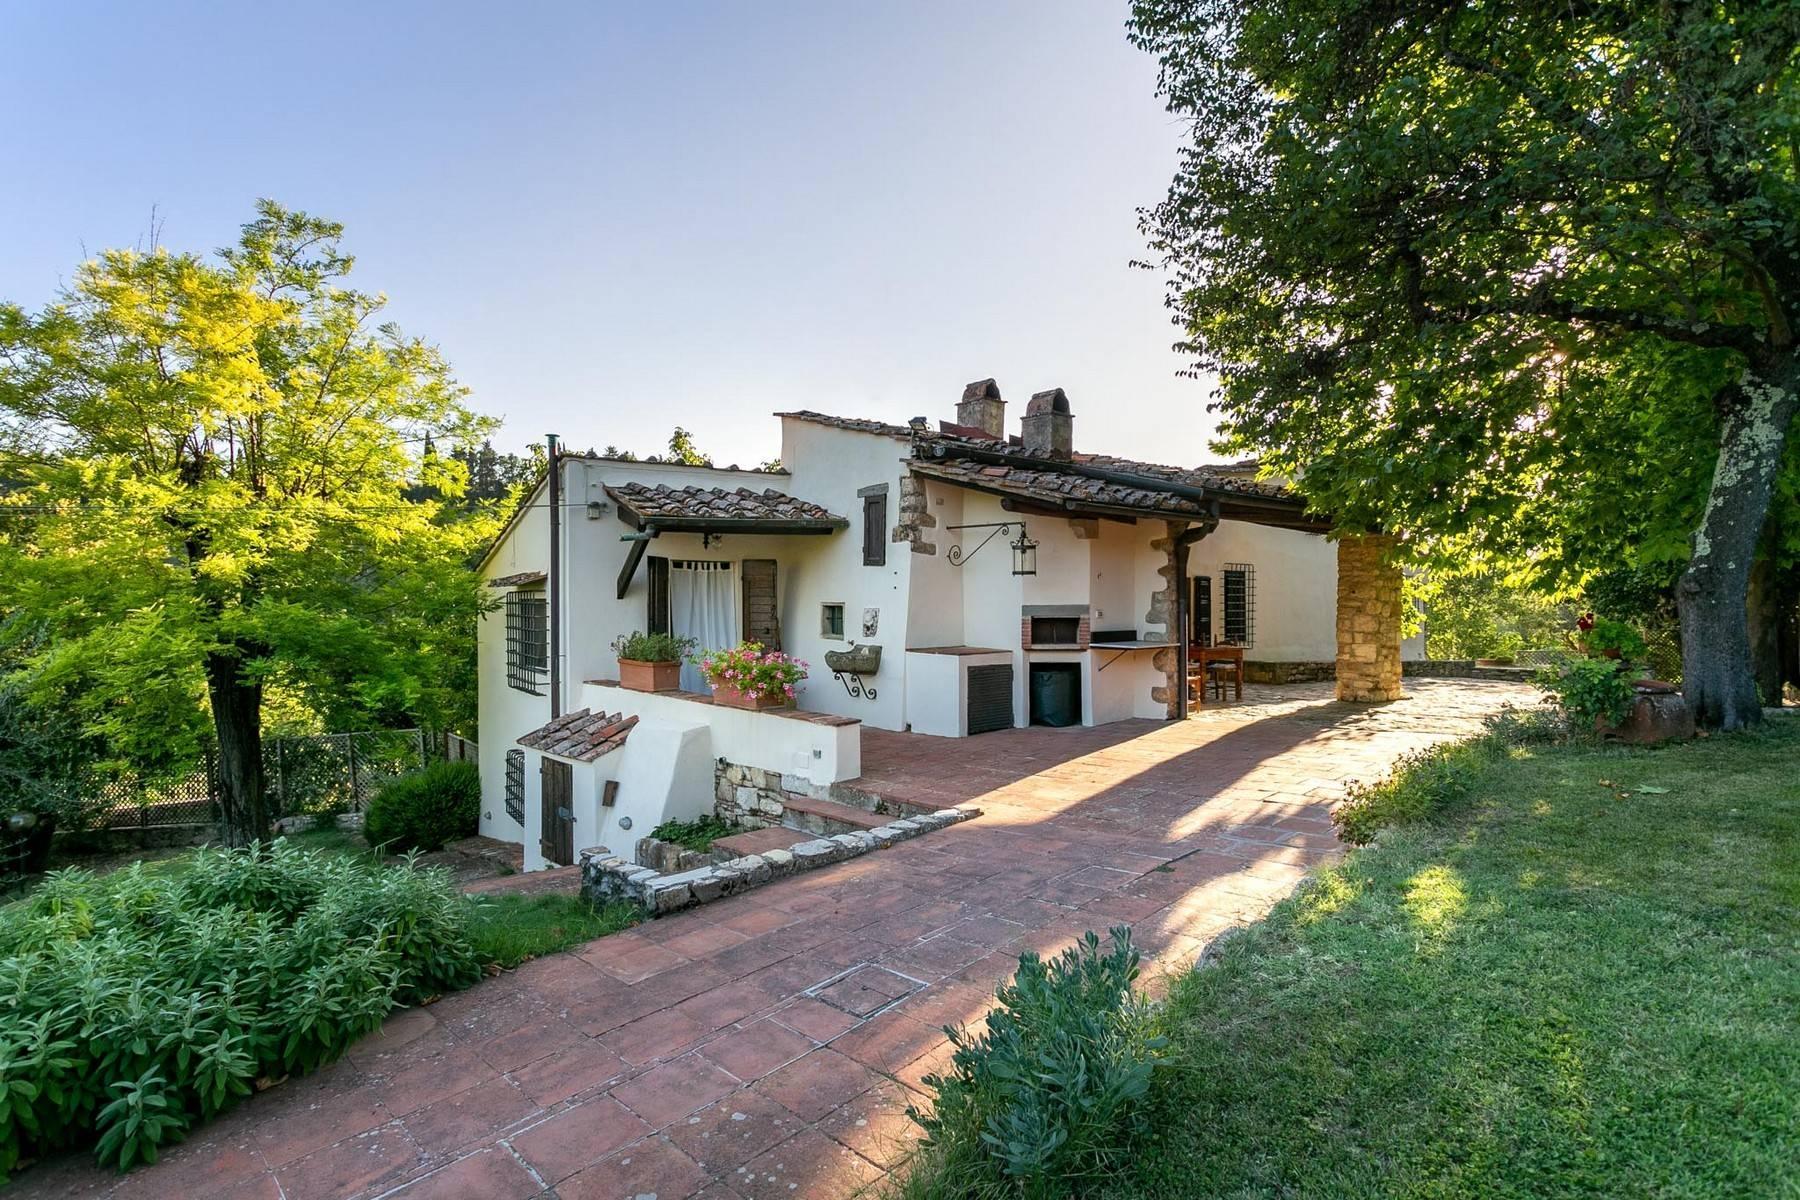 Villa immersa nel verde vicino a Firenze - 1